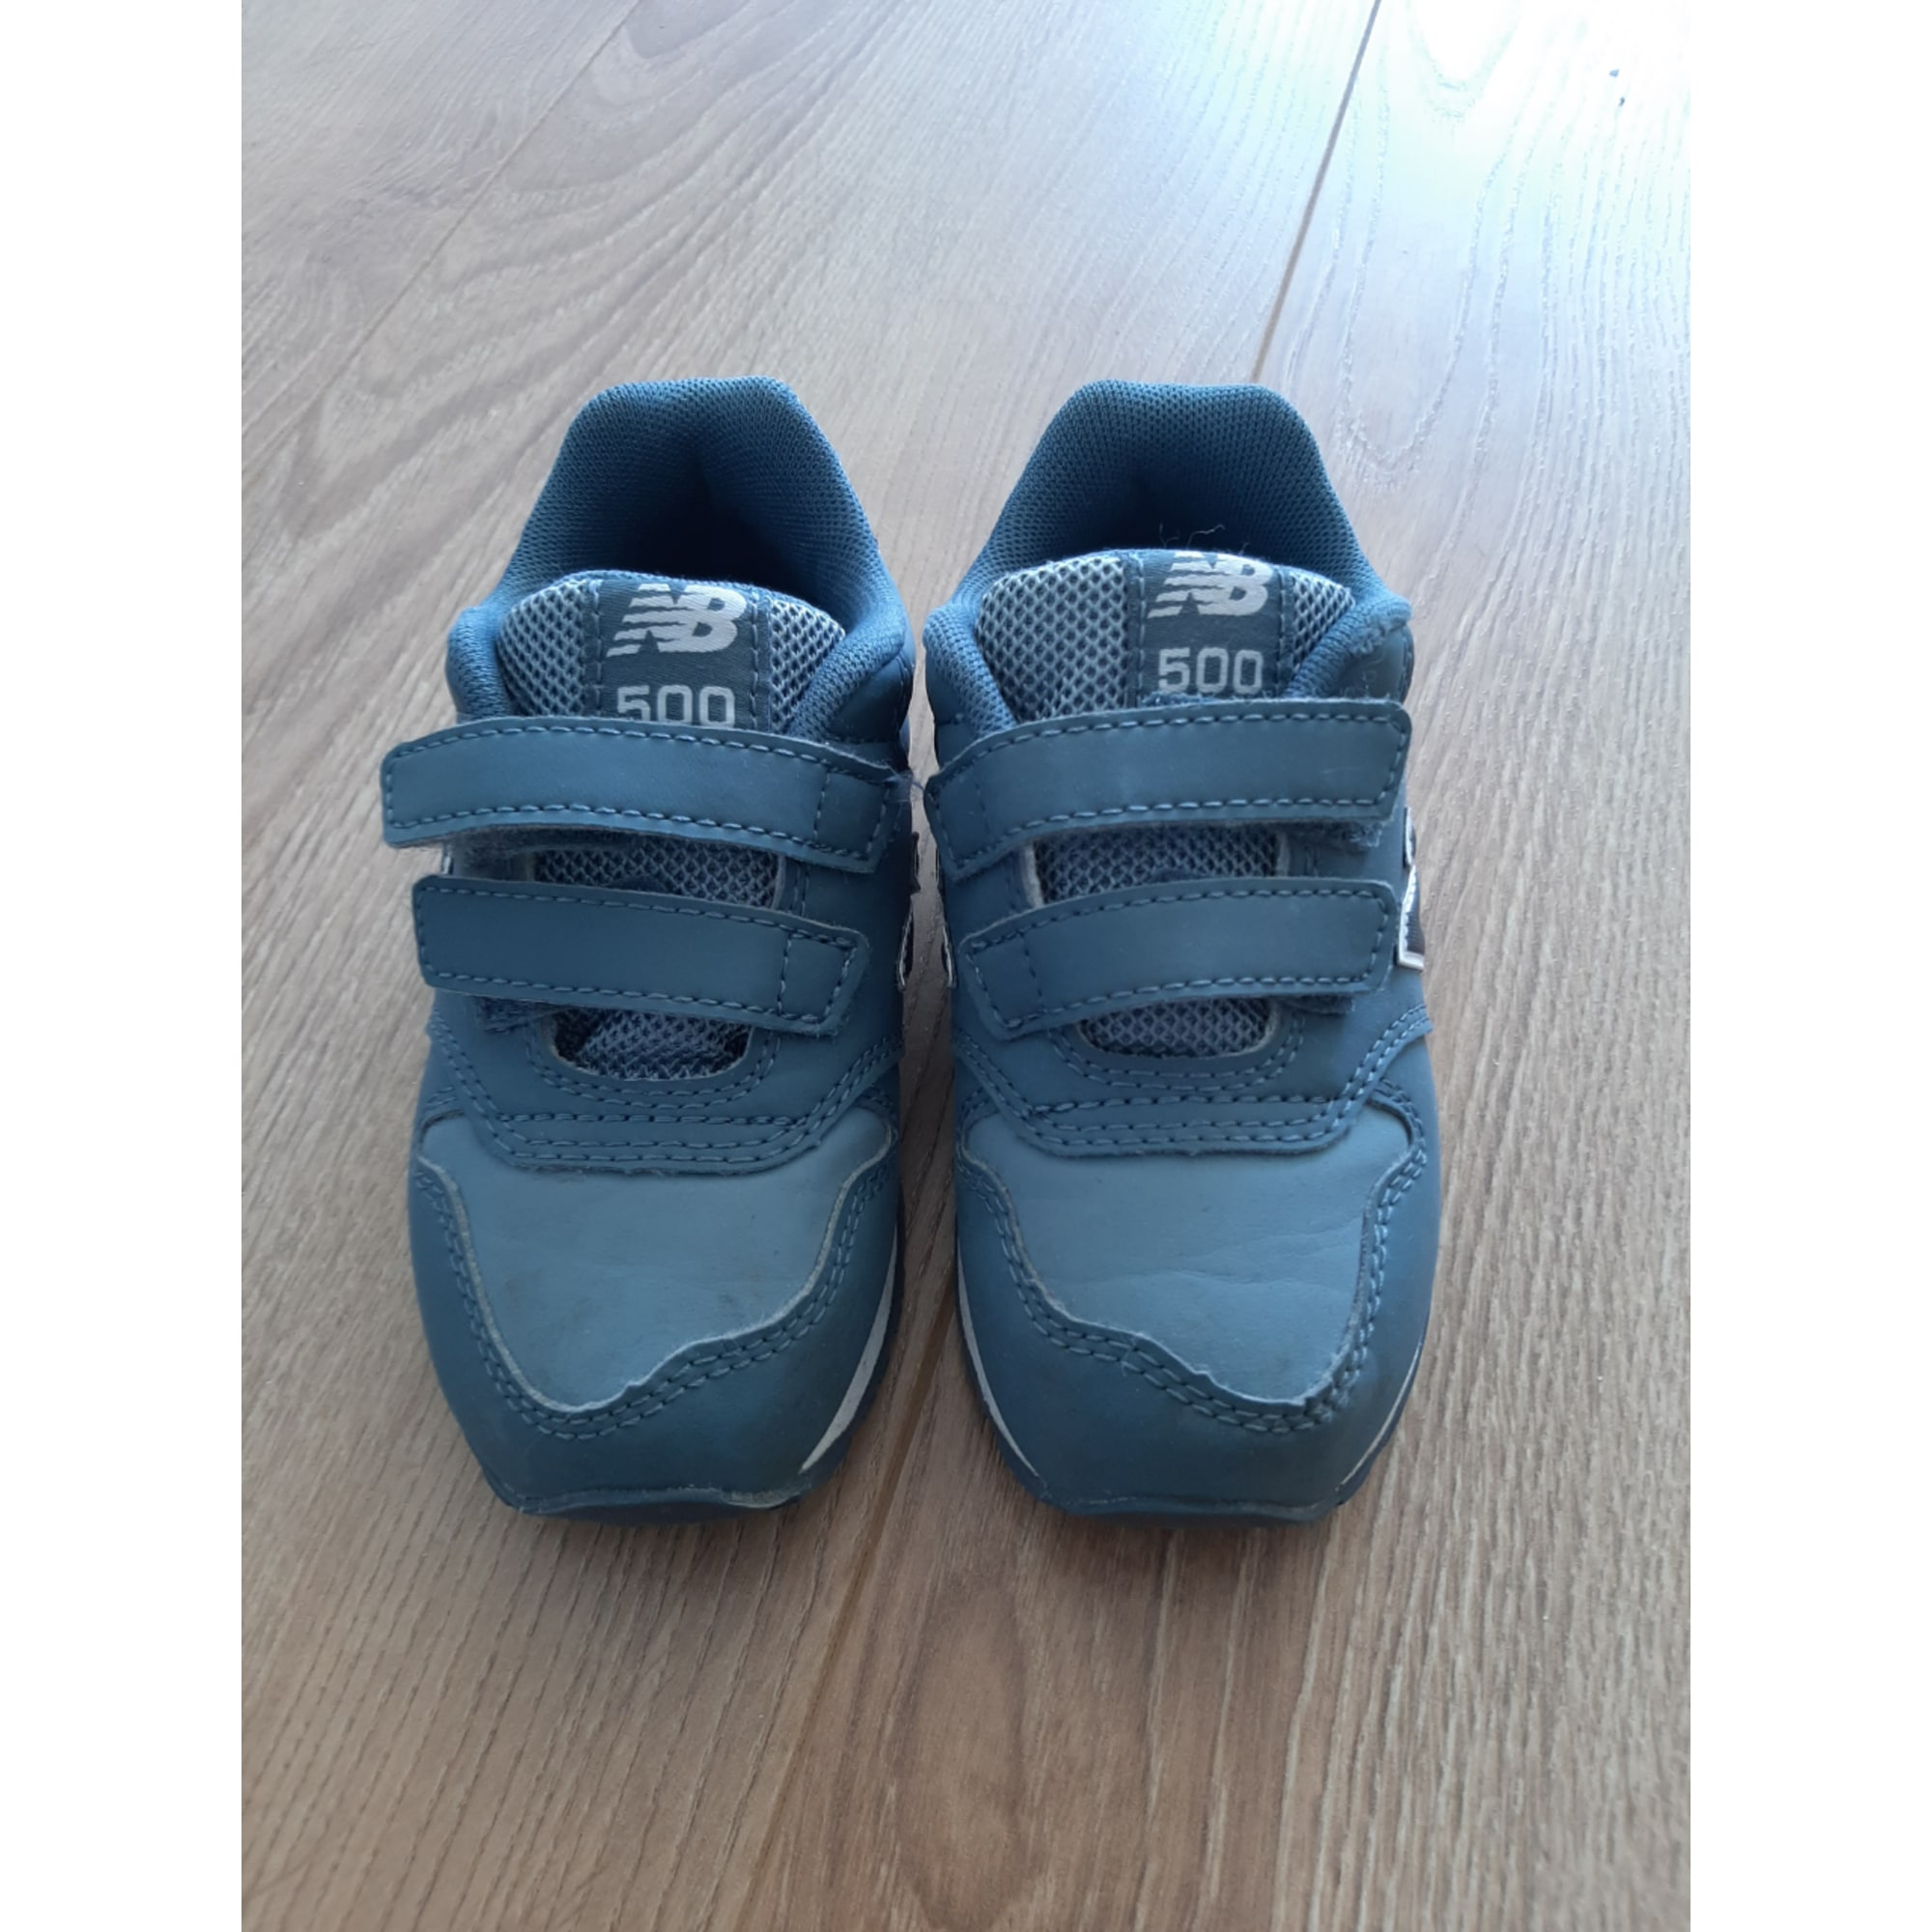 Chaussures de sport NEW BALANCE Gris, anthracite